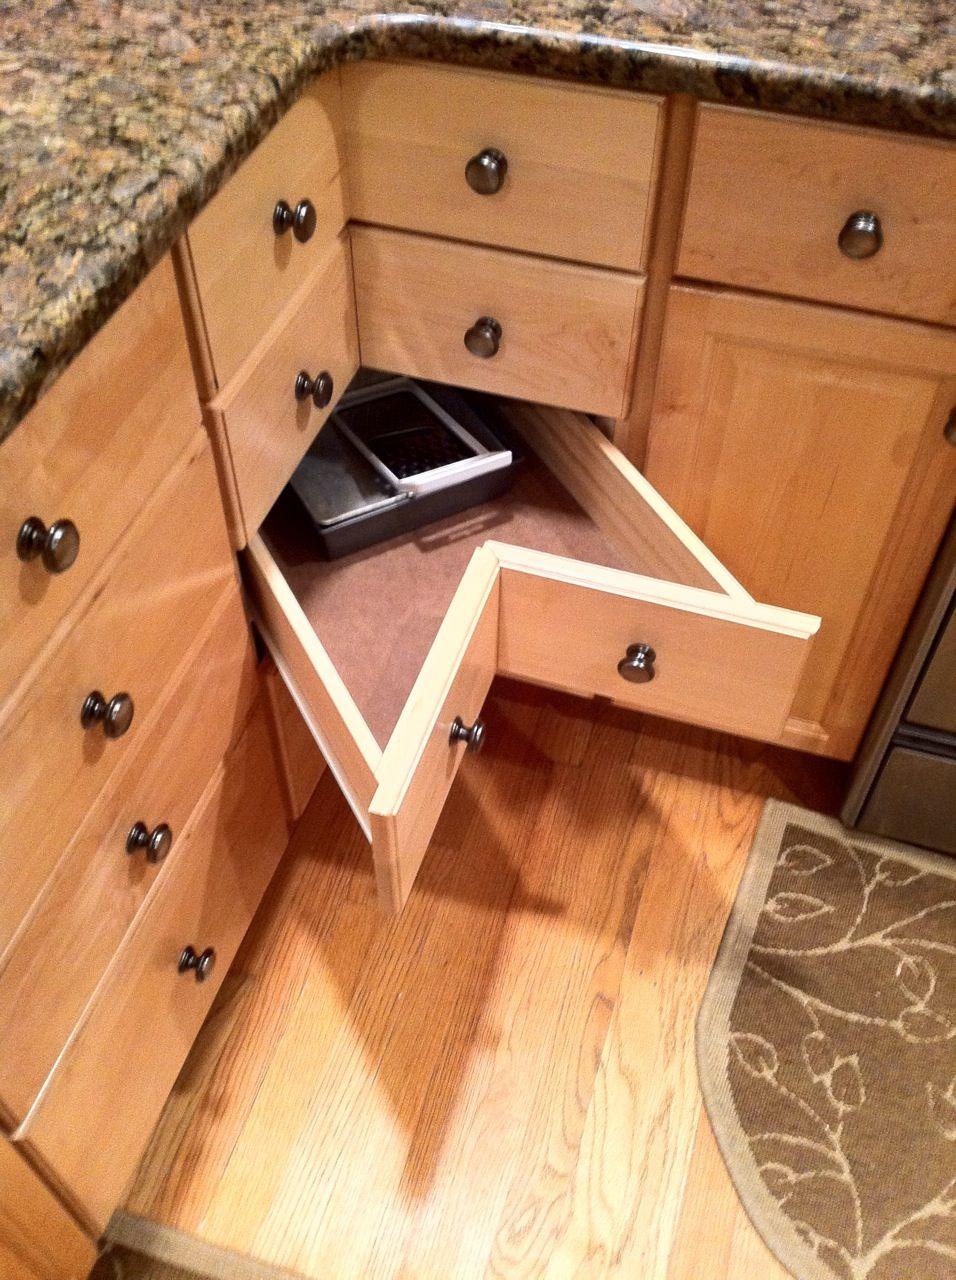 www.goodshomedesign.com diy-corner-cabinet-drawers | house ideas ...